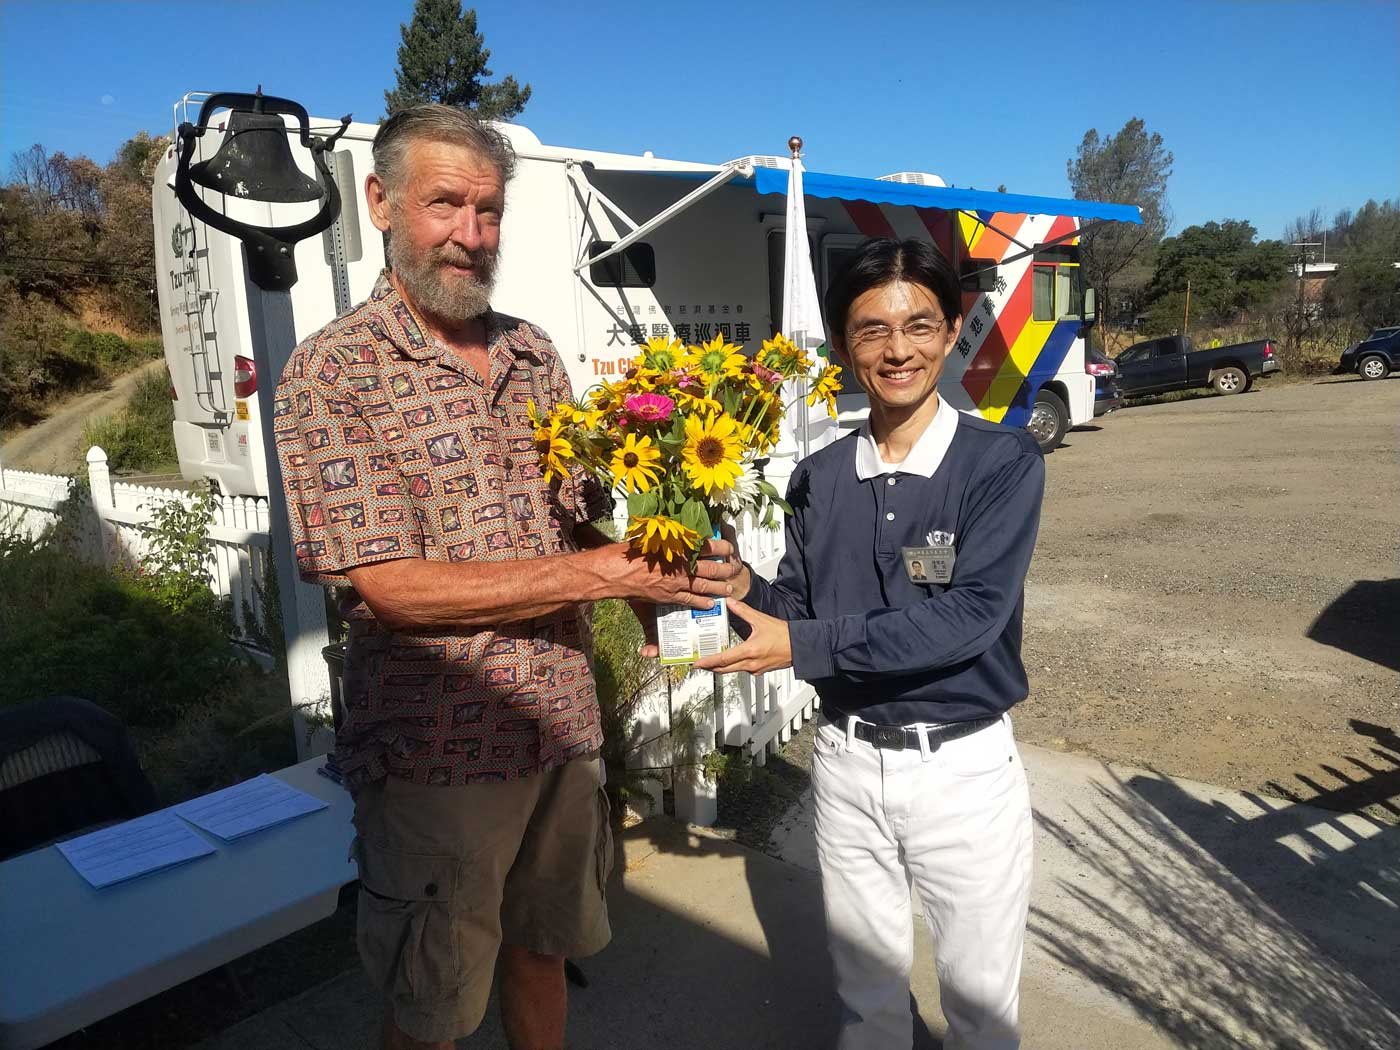 TzuChiUSA_camp-fire-medical-outreach-IMG_20190721_090658